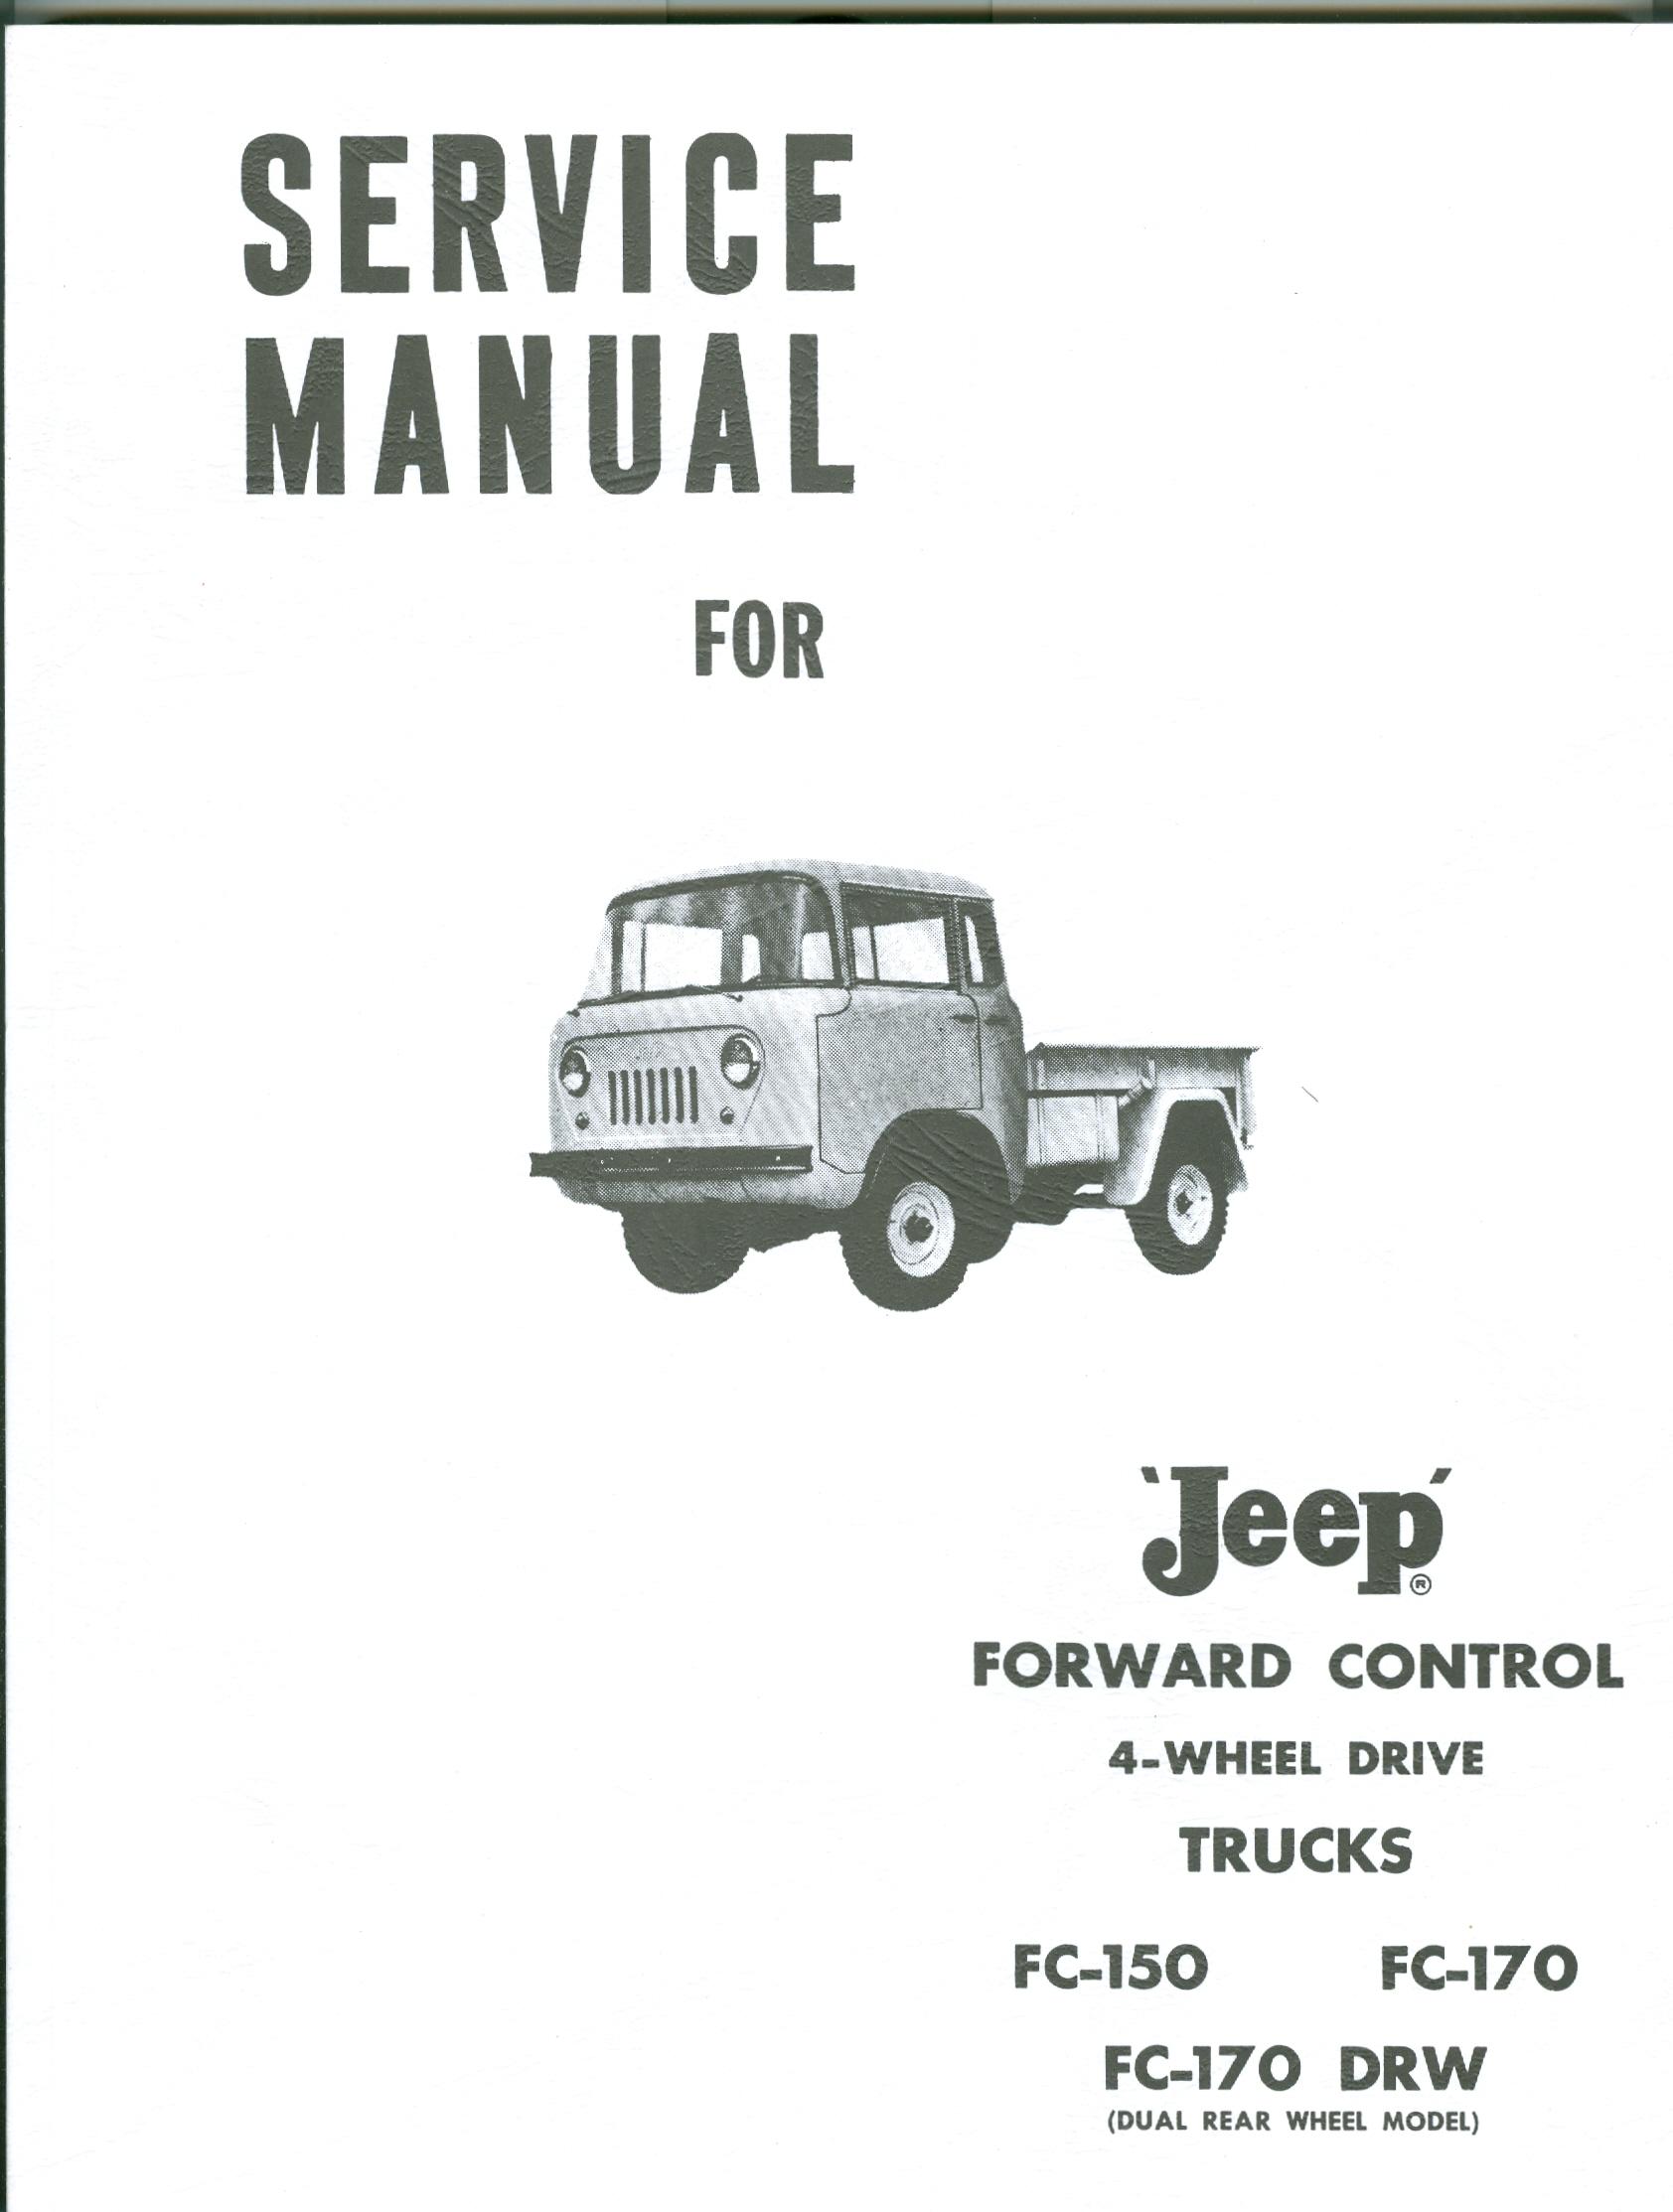 fc fj jeep service manuals original reproductions llc yuma rh originalreproductionsllc com Jeep CJ Rebuilders Manual Jeep Wrangler Repair Manual Chilton